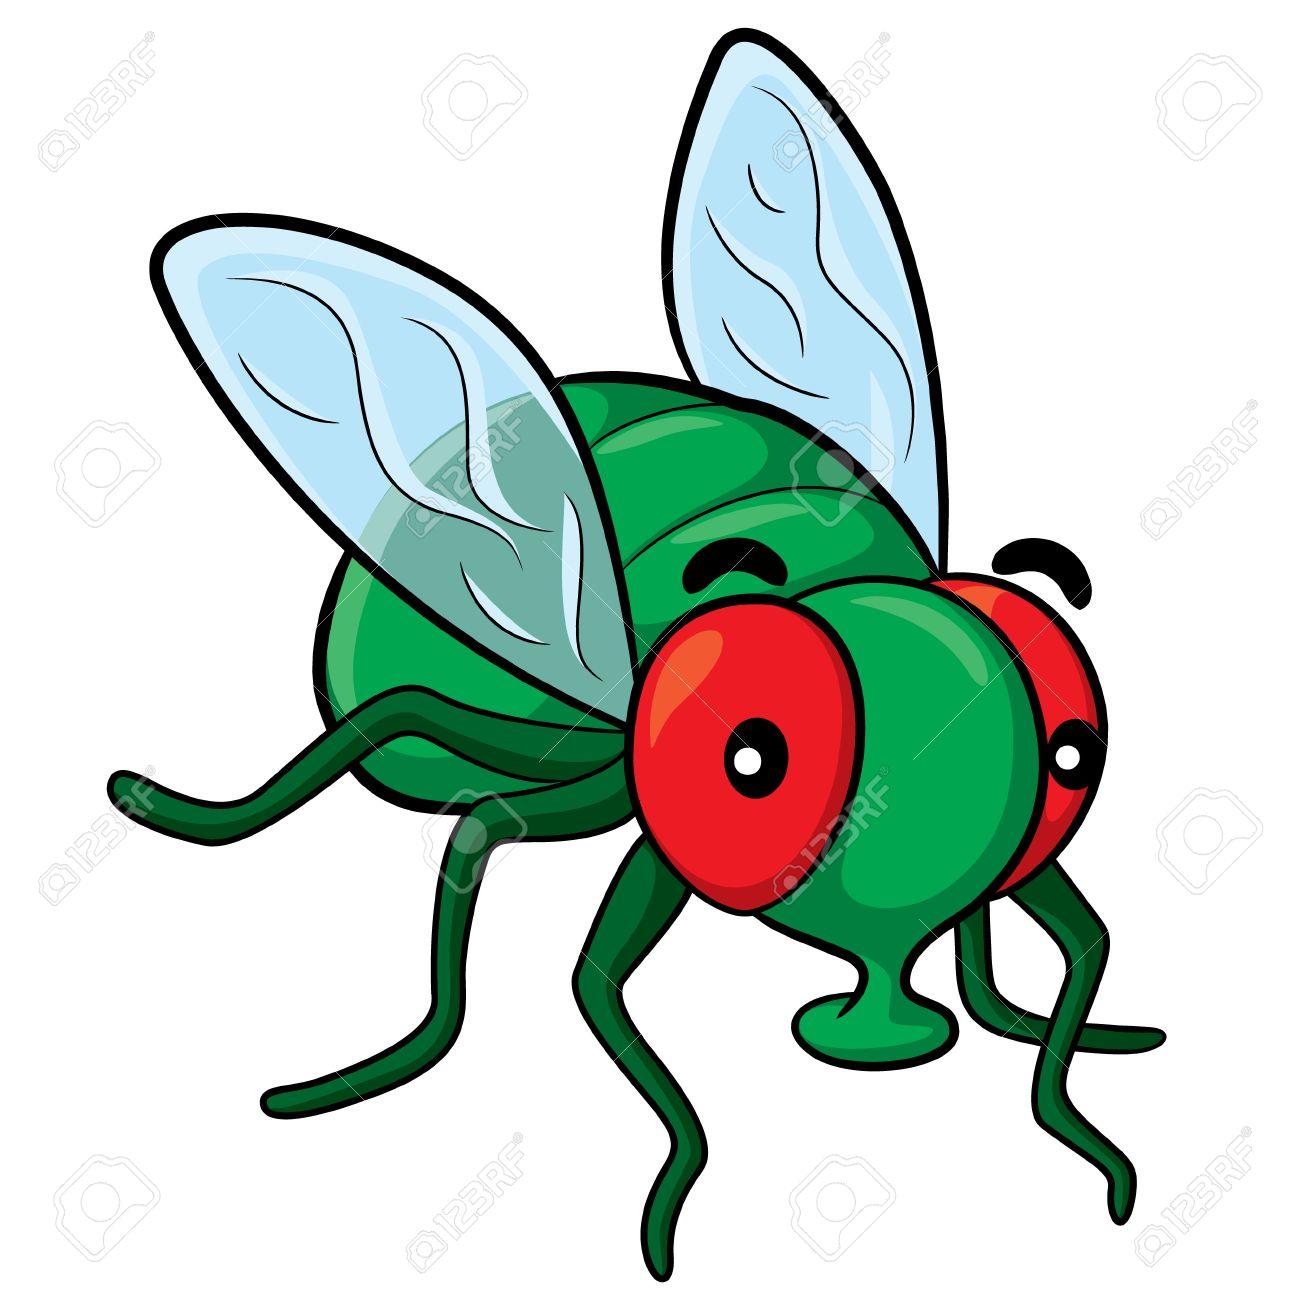 Illustration of cute cartoon fly. Stock Vector - 48843367